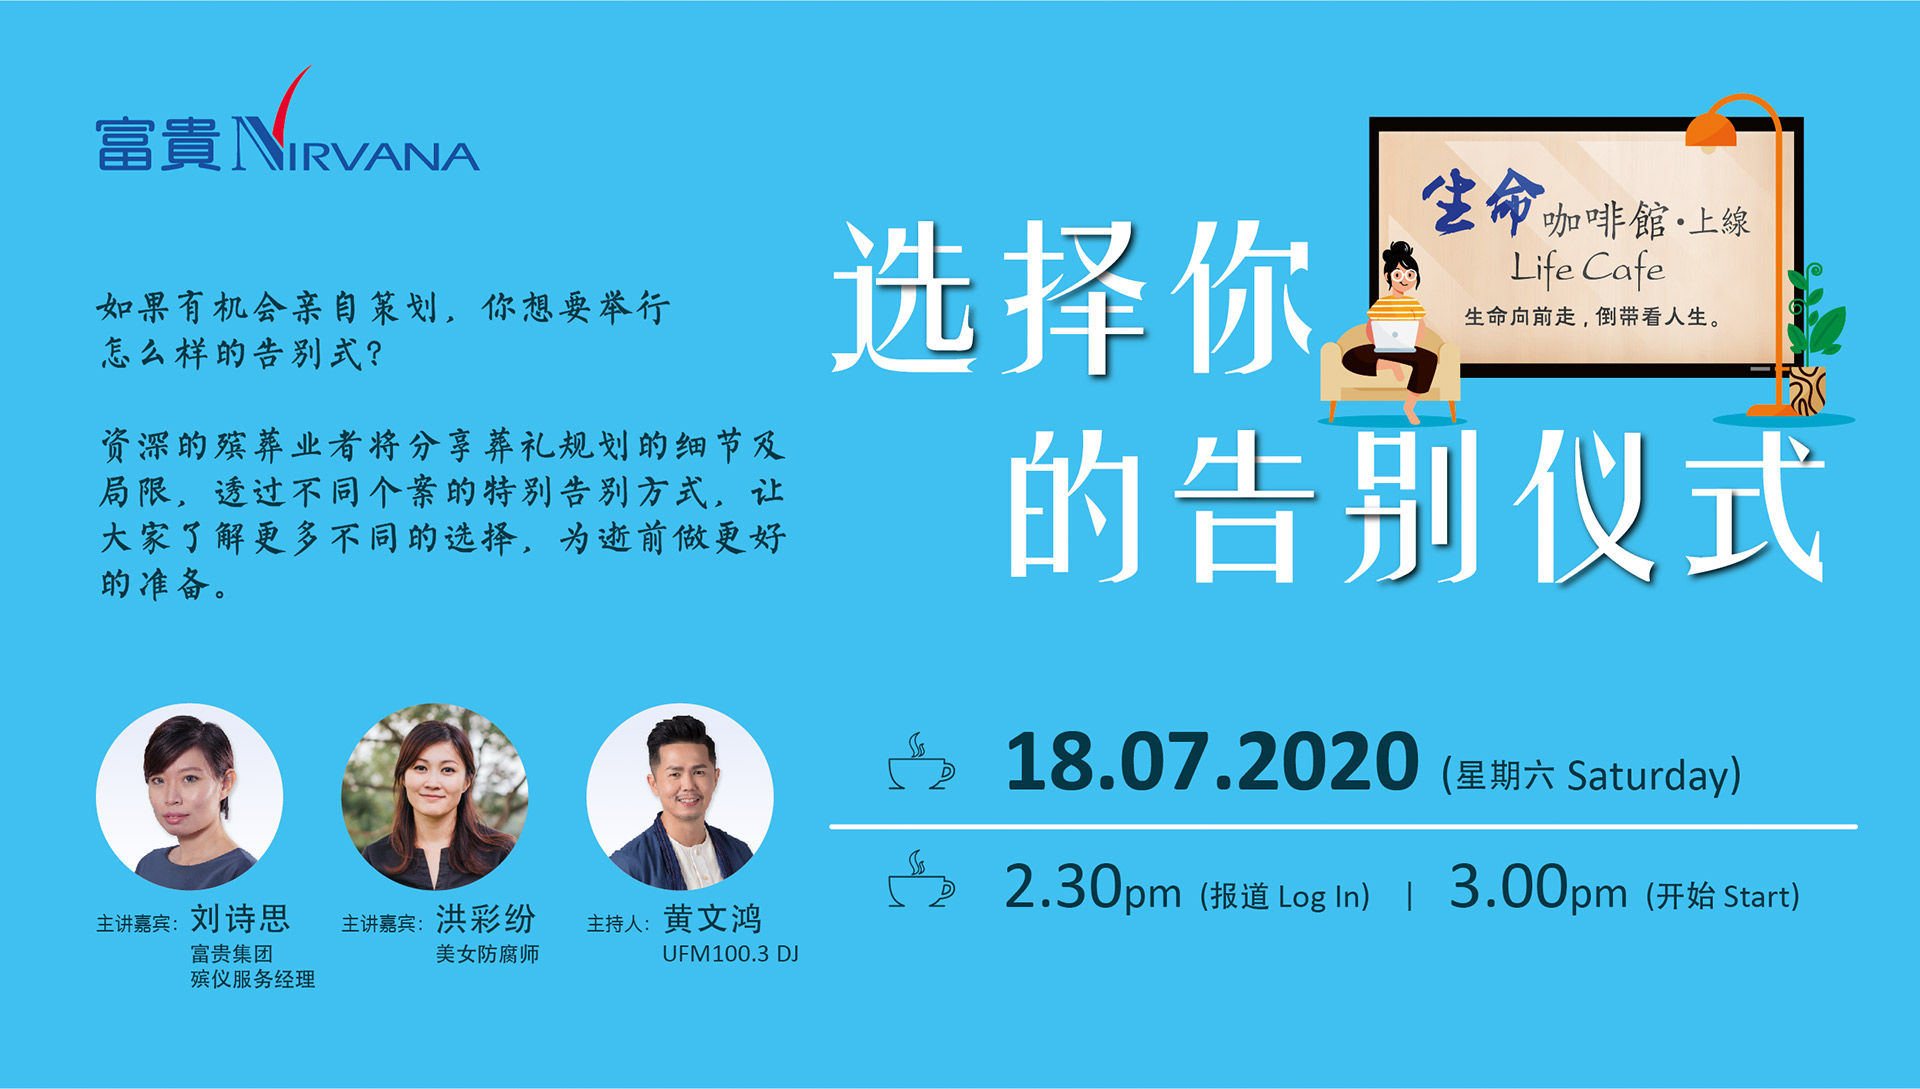 Life Cafe • Online – 《选择你的告别仪式》Online Seminar